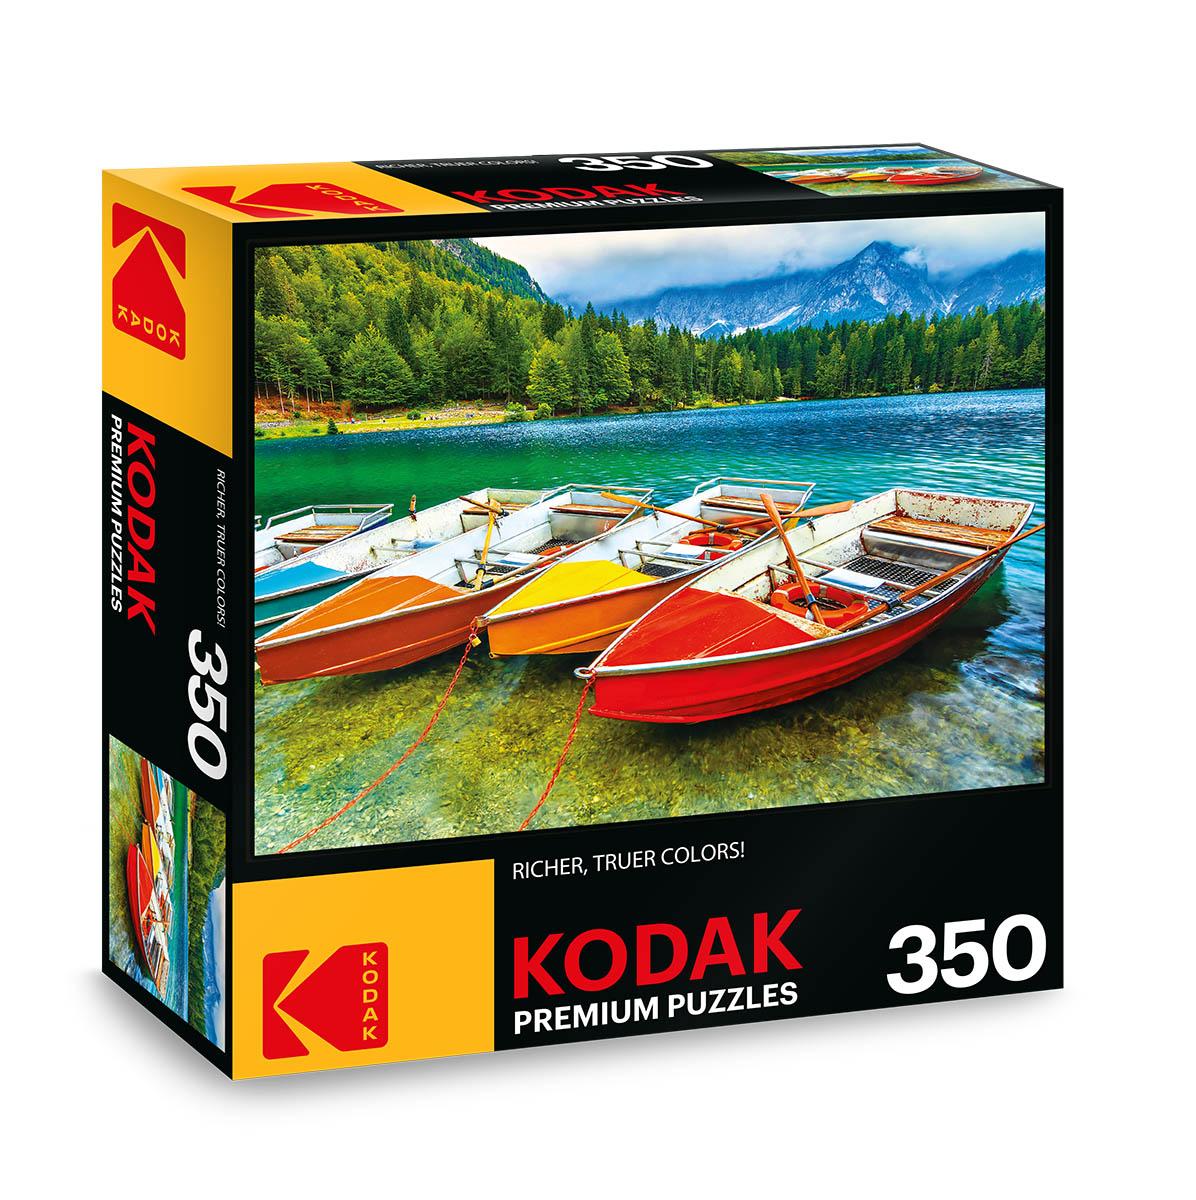 KODAK Premium Puzzles - Colorful Boats on the Lake Boats Jigsaw Puzzle